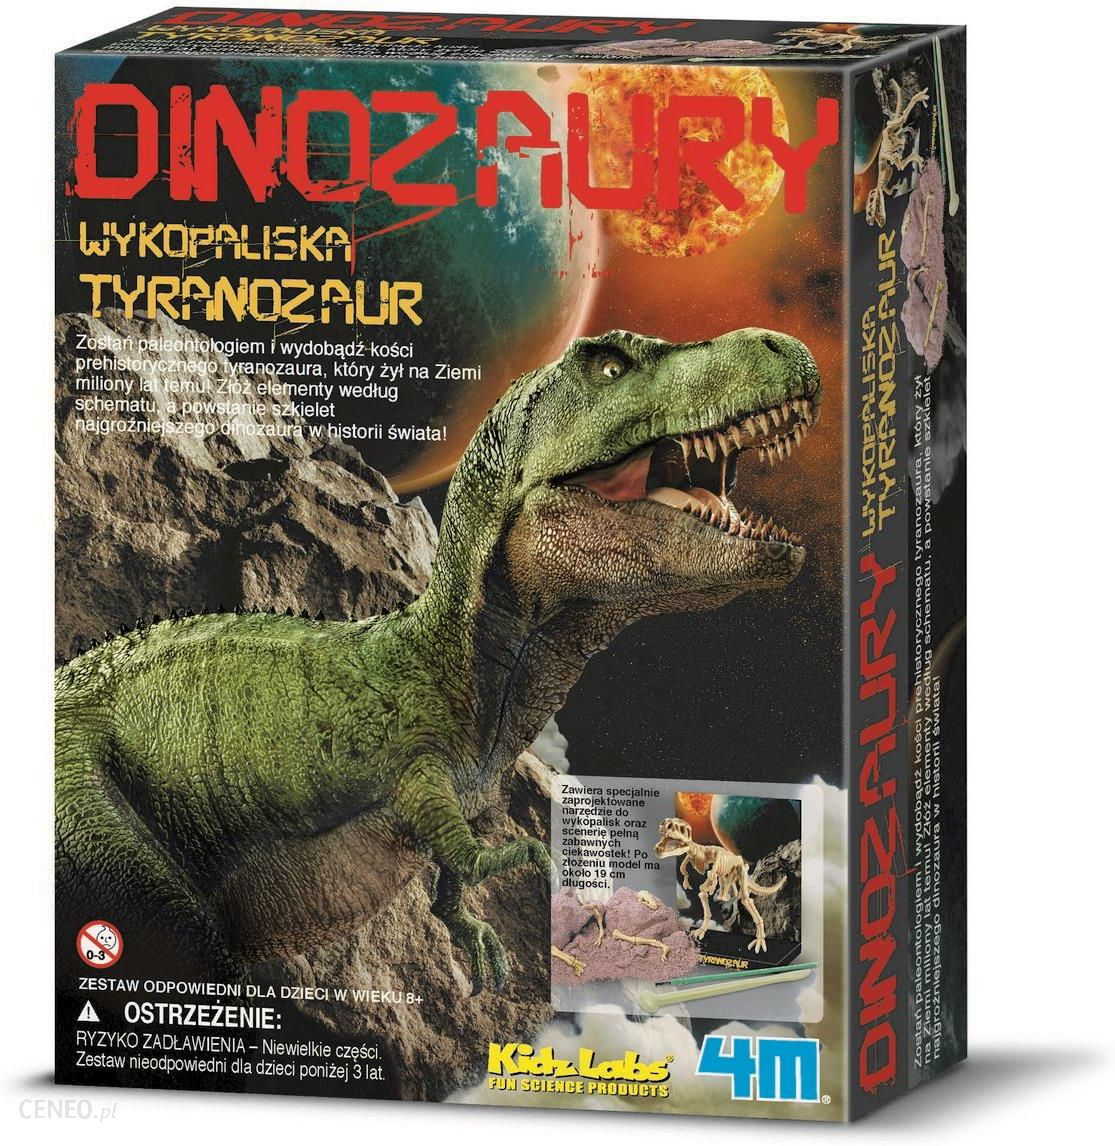 4M Wykopaliska Tyranozaur Trex 3221